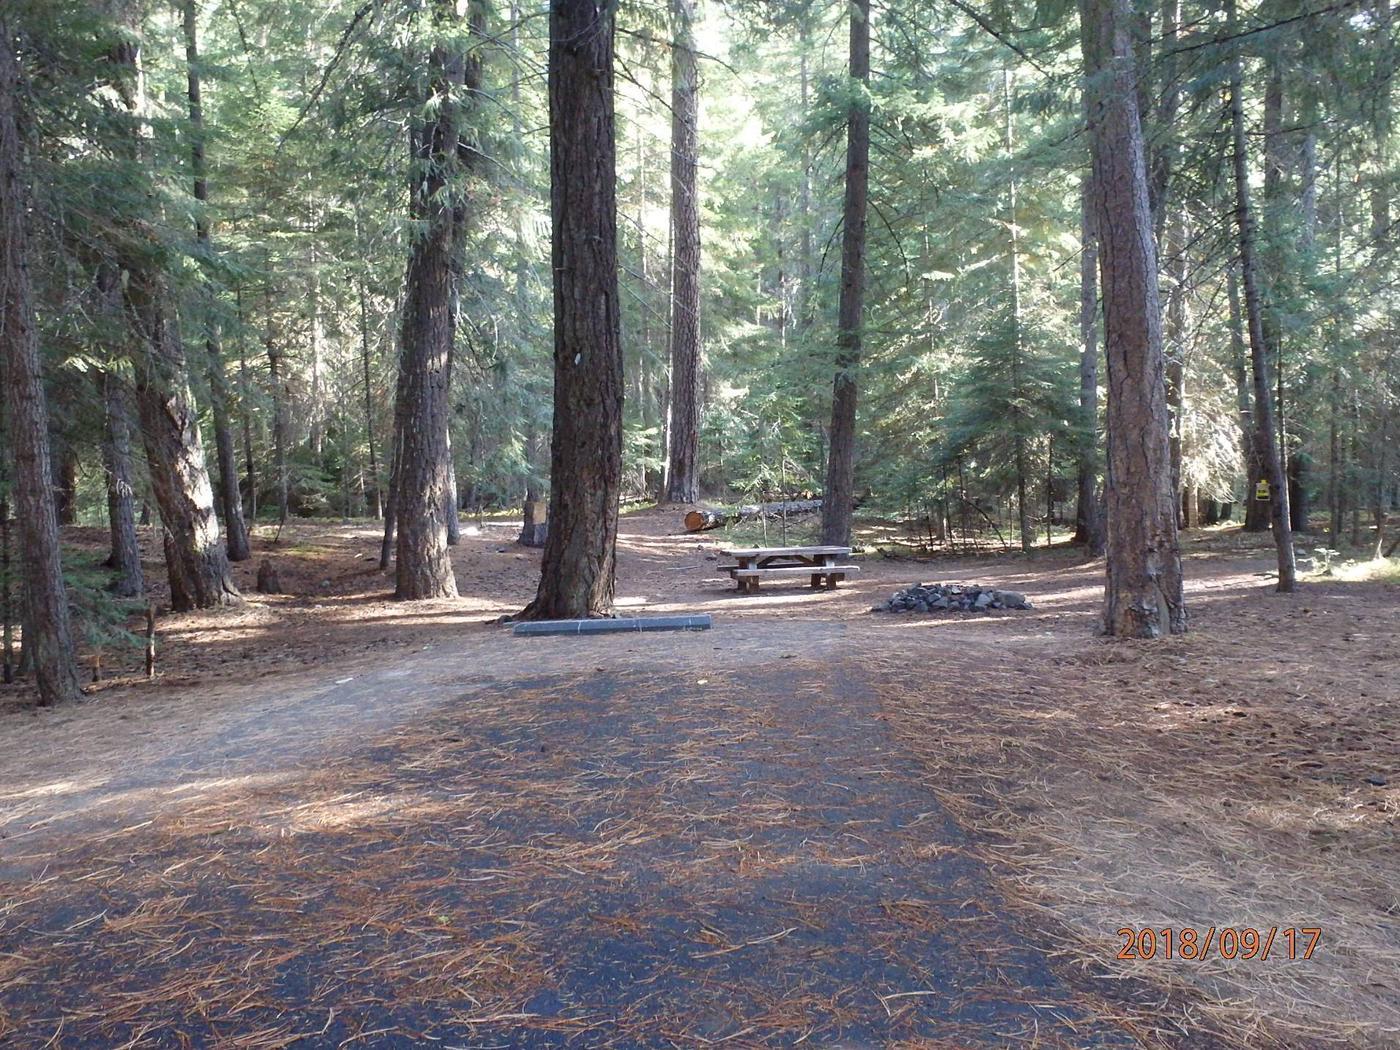 Kaner FlatNice site with paved parking spur